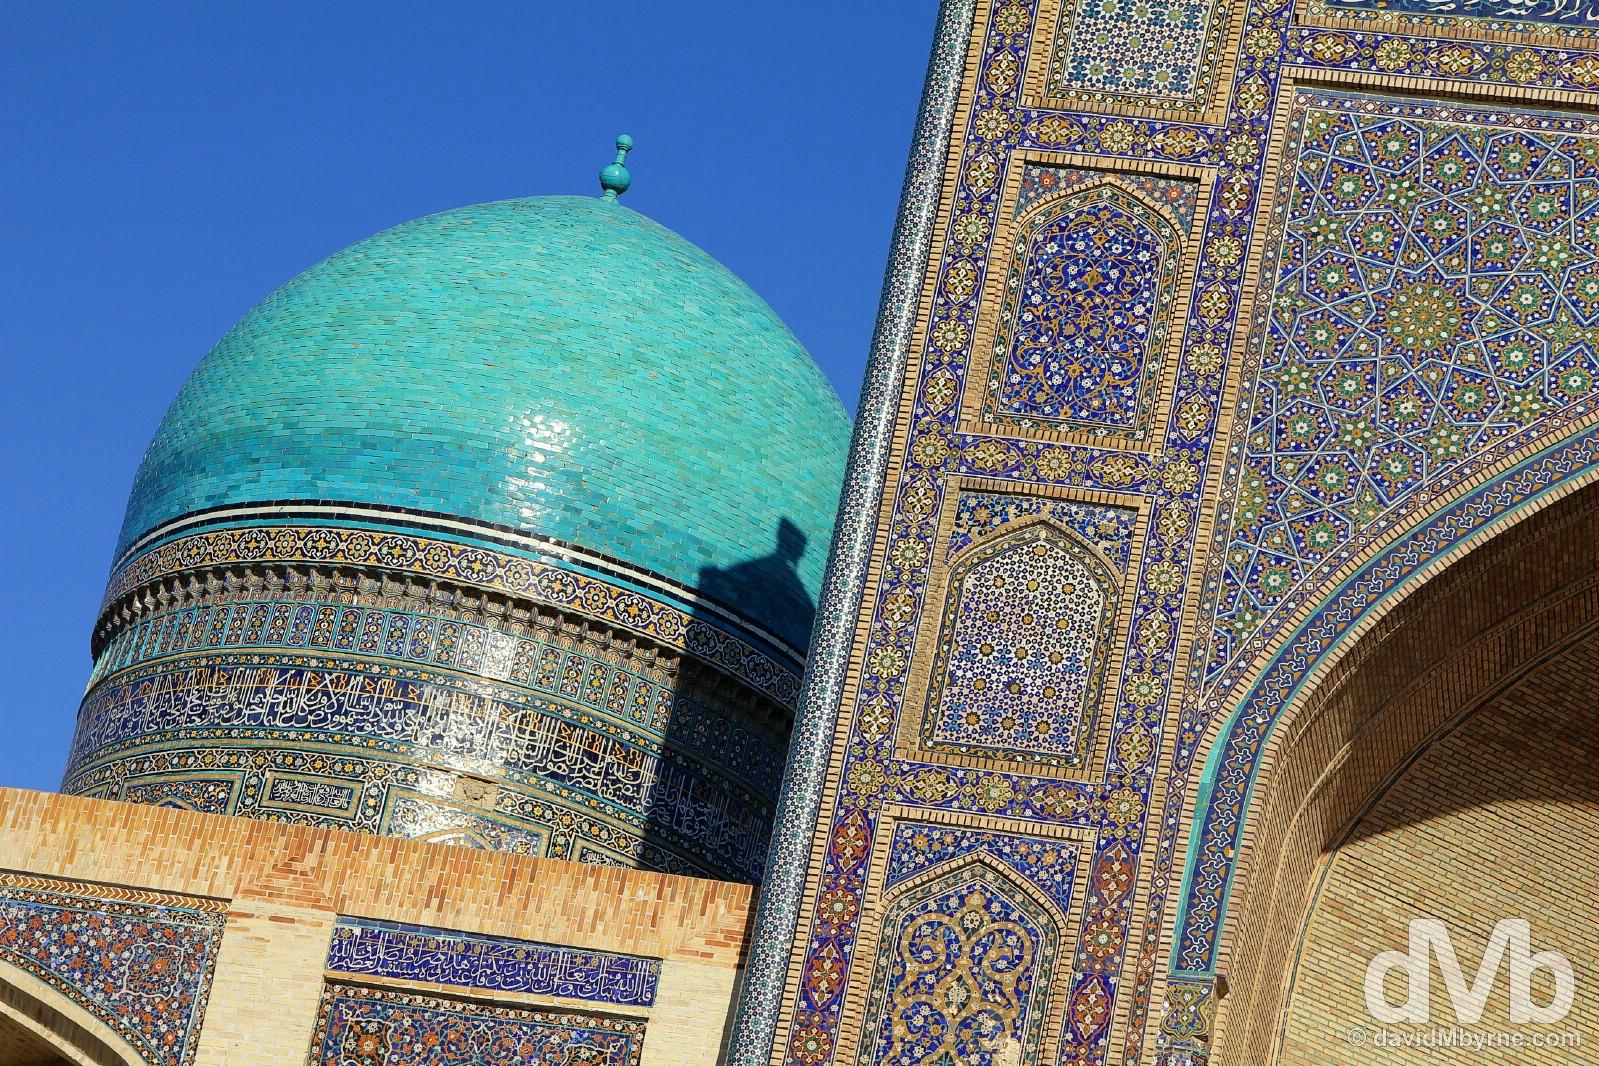 Mir-i-Arab Medressa, Bukhara, Uzbekistan. March 11, 2015.